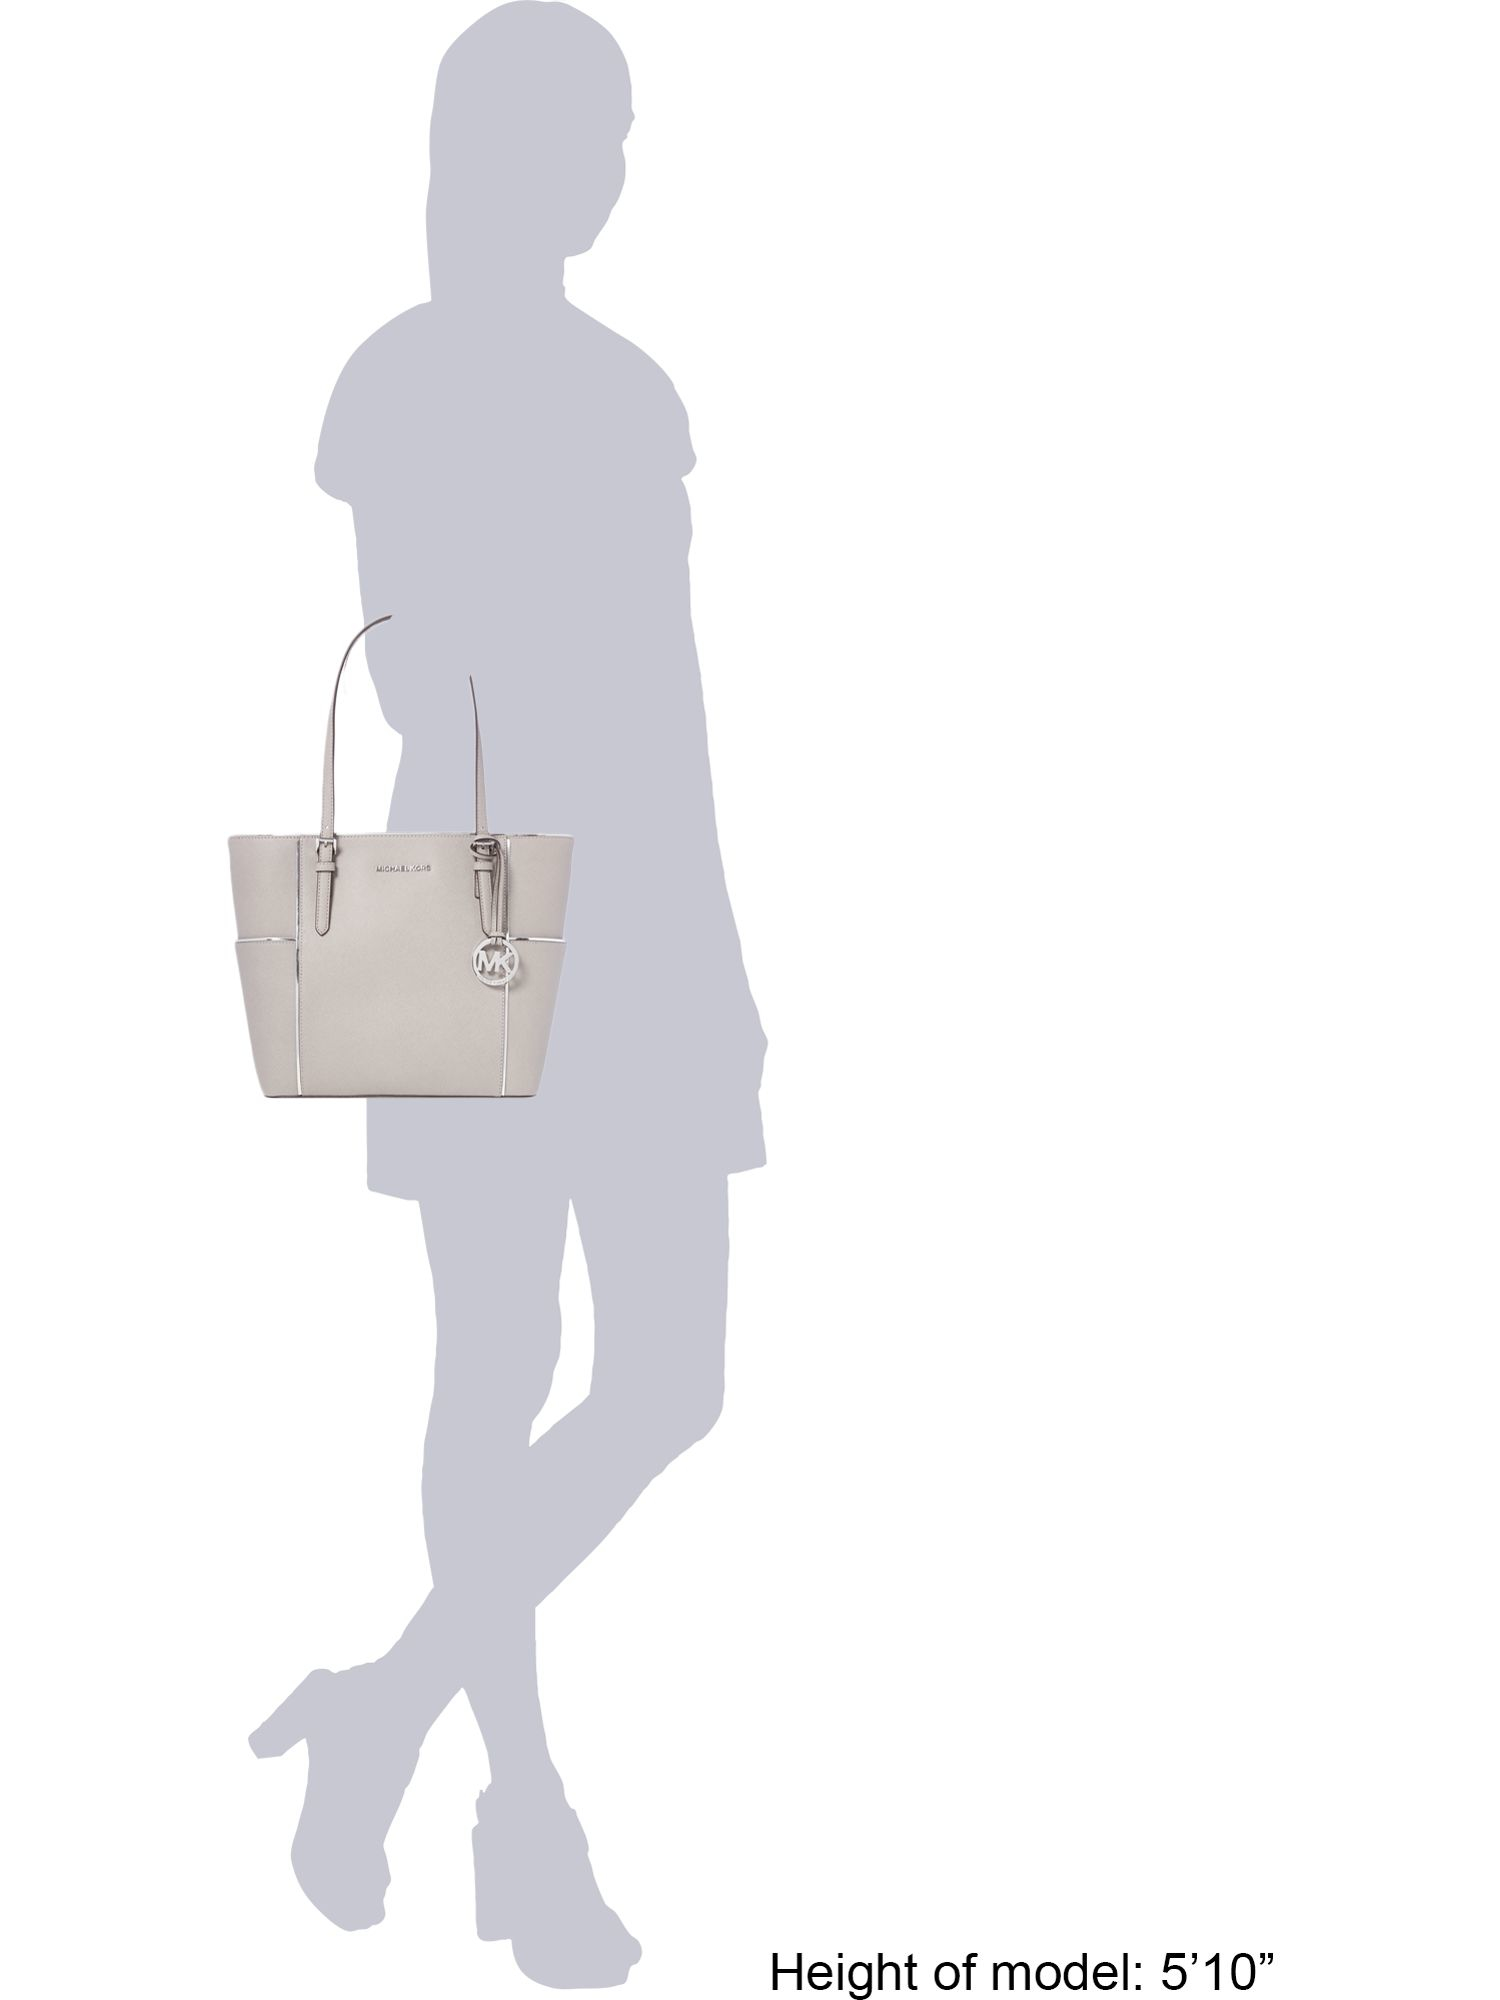 Michael Kors Jetset Grey Pocket Tote Bag in Grey